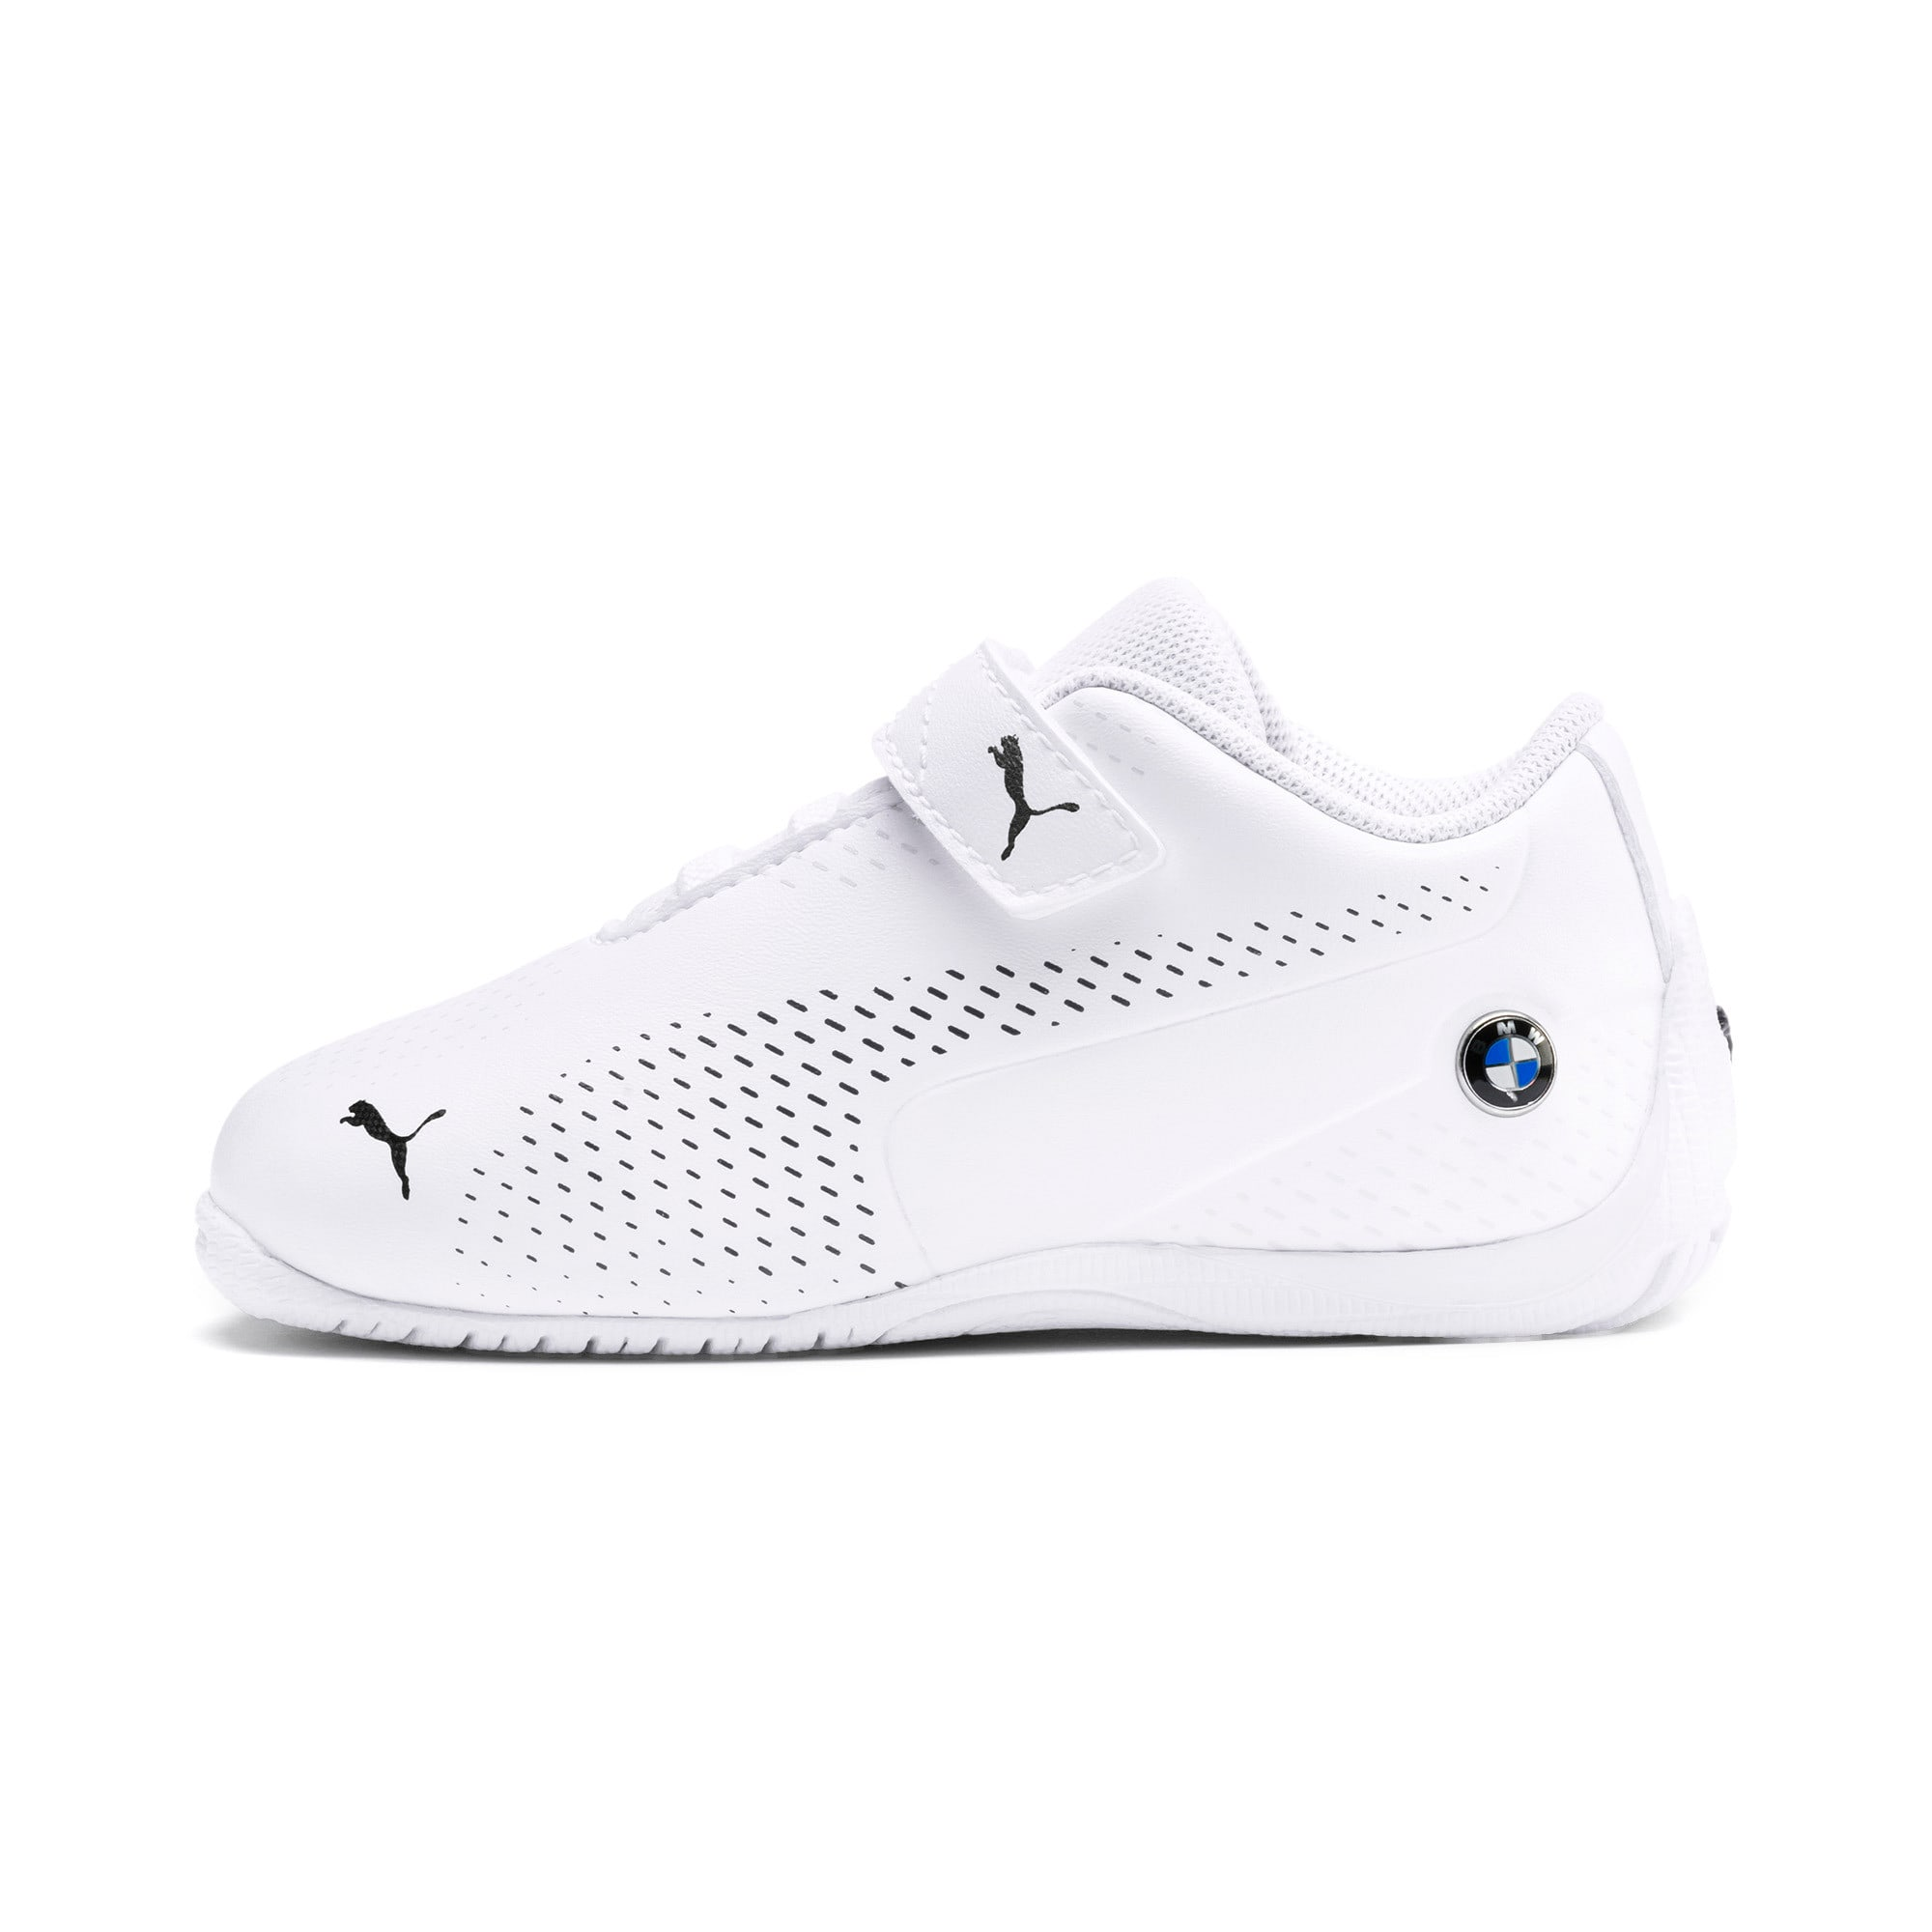 Thumbnail 1 of BMW M Motorsport Drift Cat 5 Ultra II Toddler Shoes, Puma White-Puma Black, medium